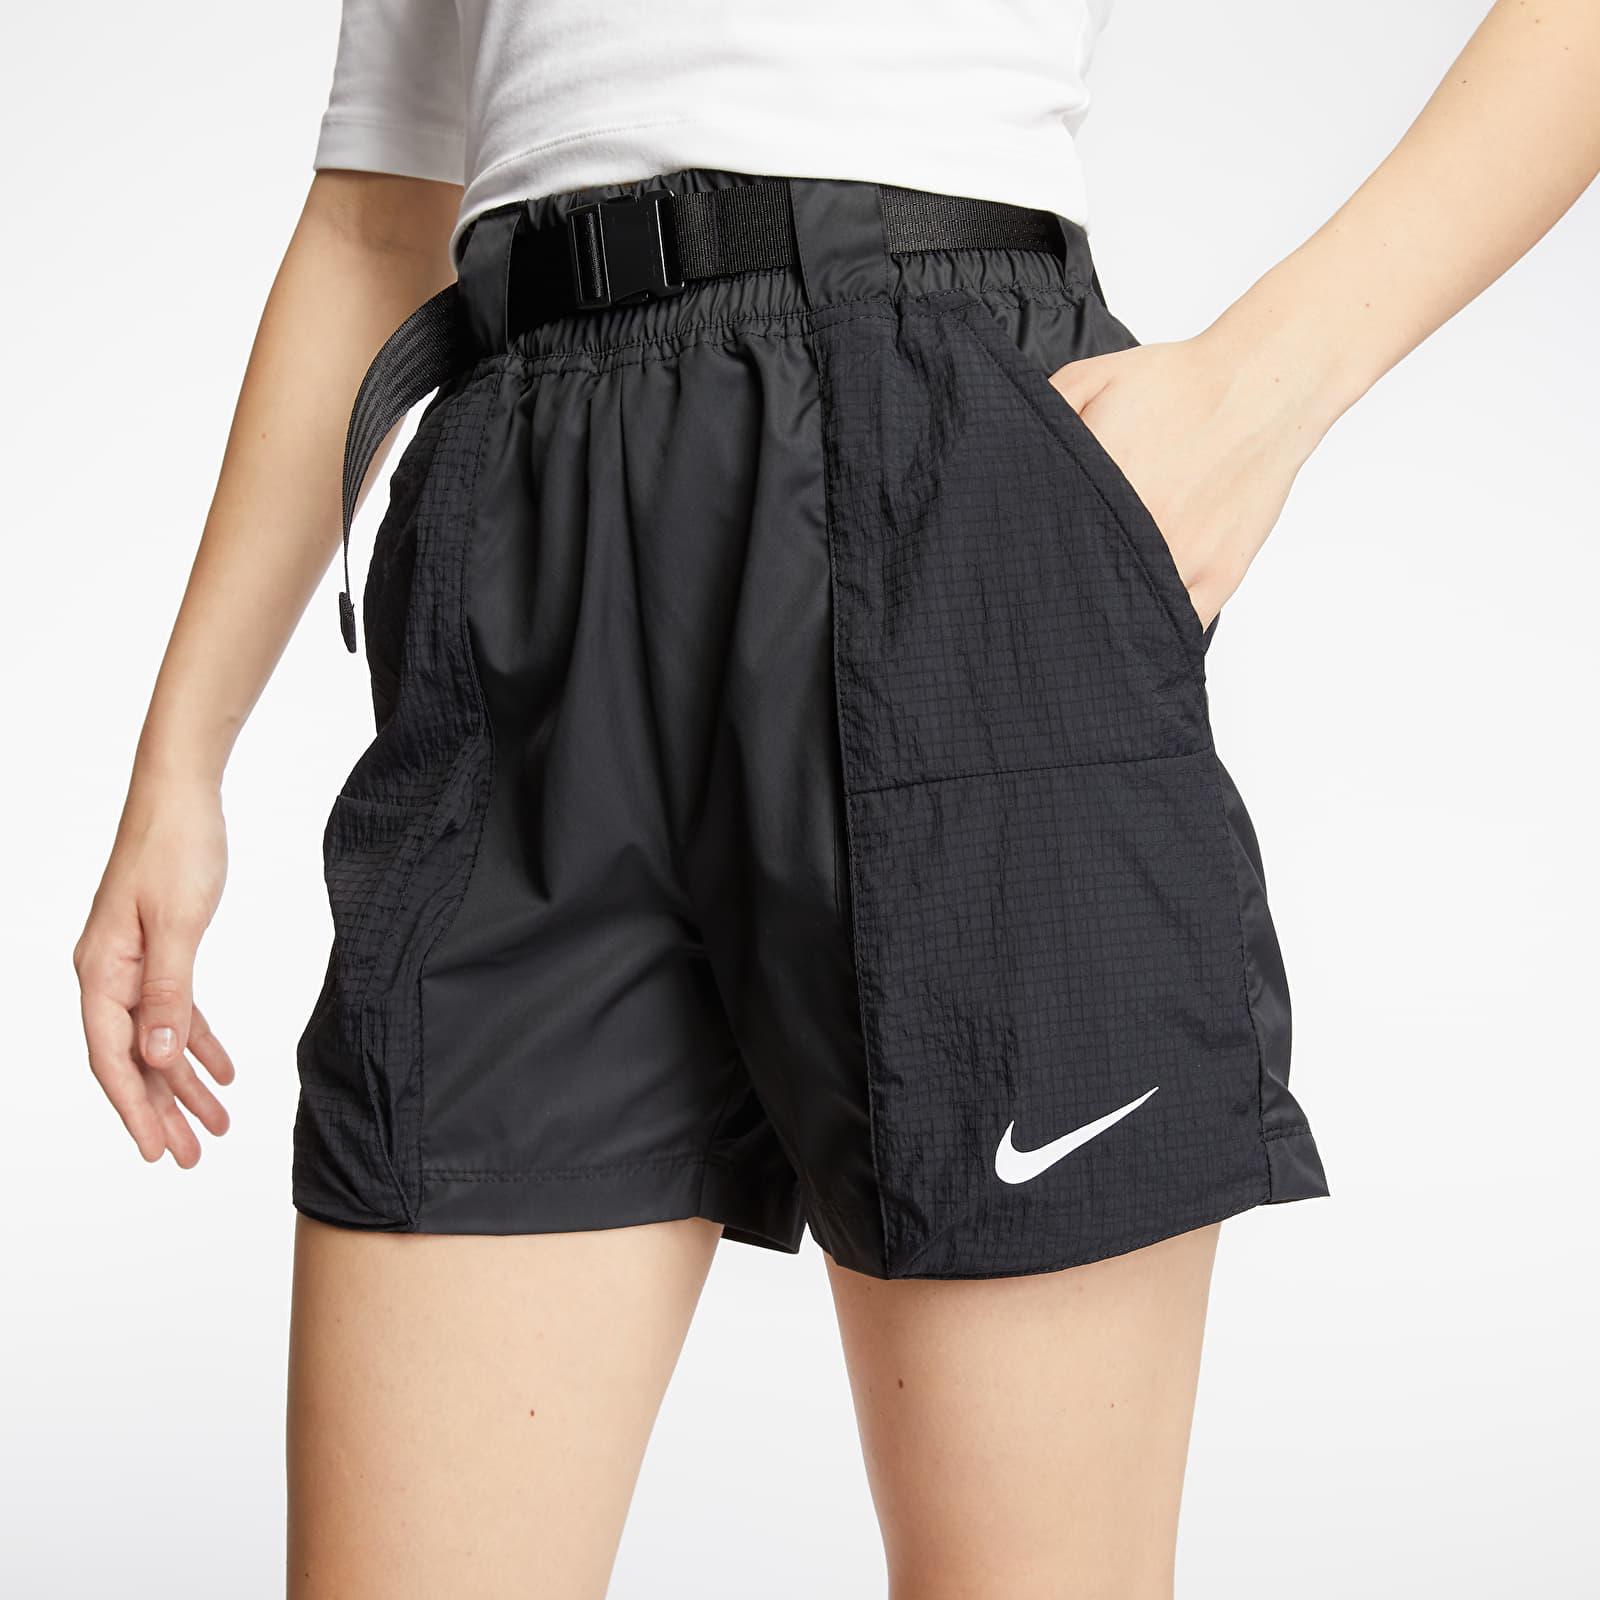 Šortky Nike Sportswear Swoosh Woven Shorts Black/ White